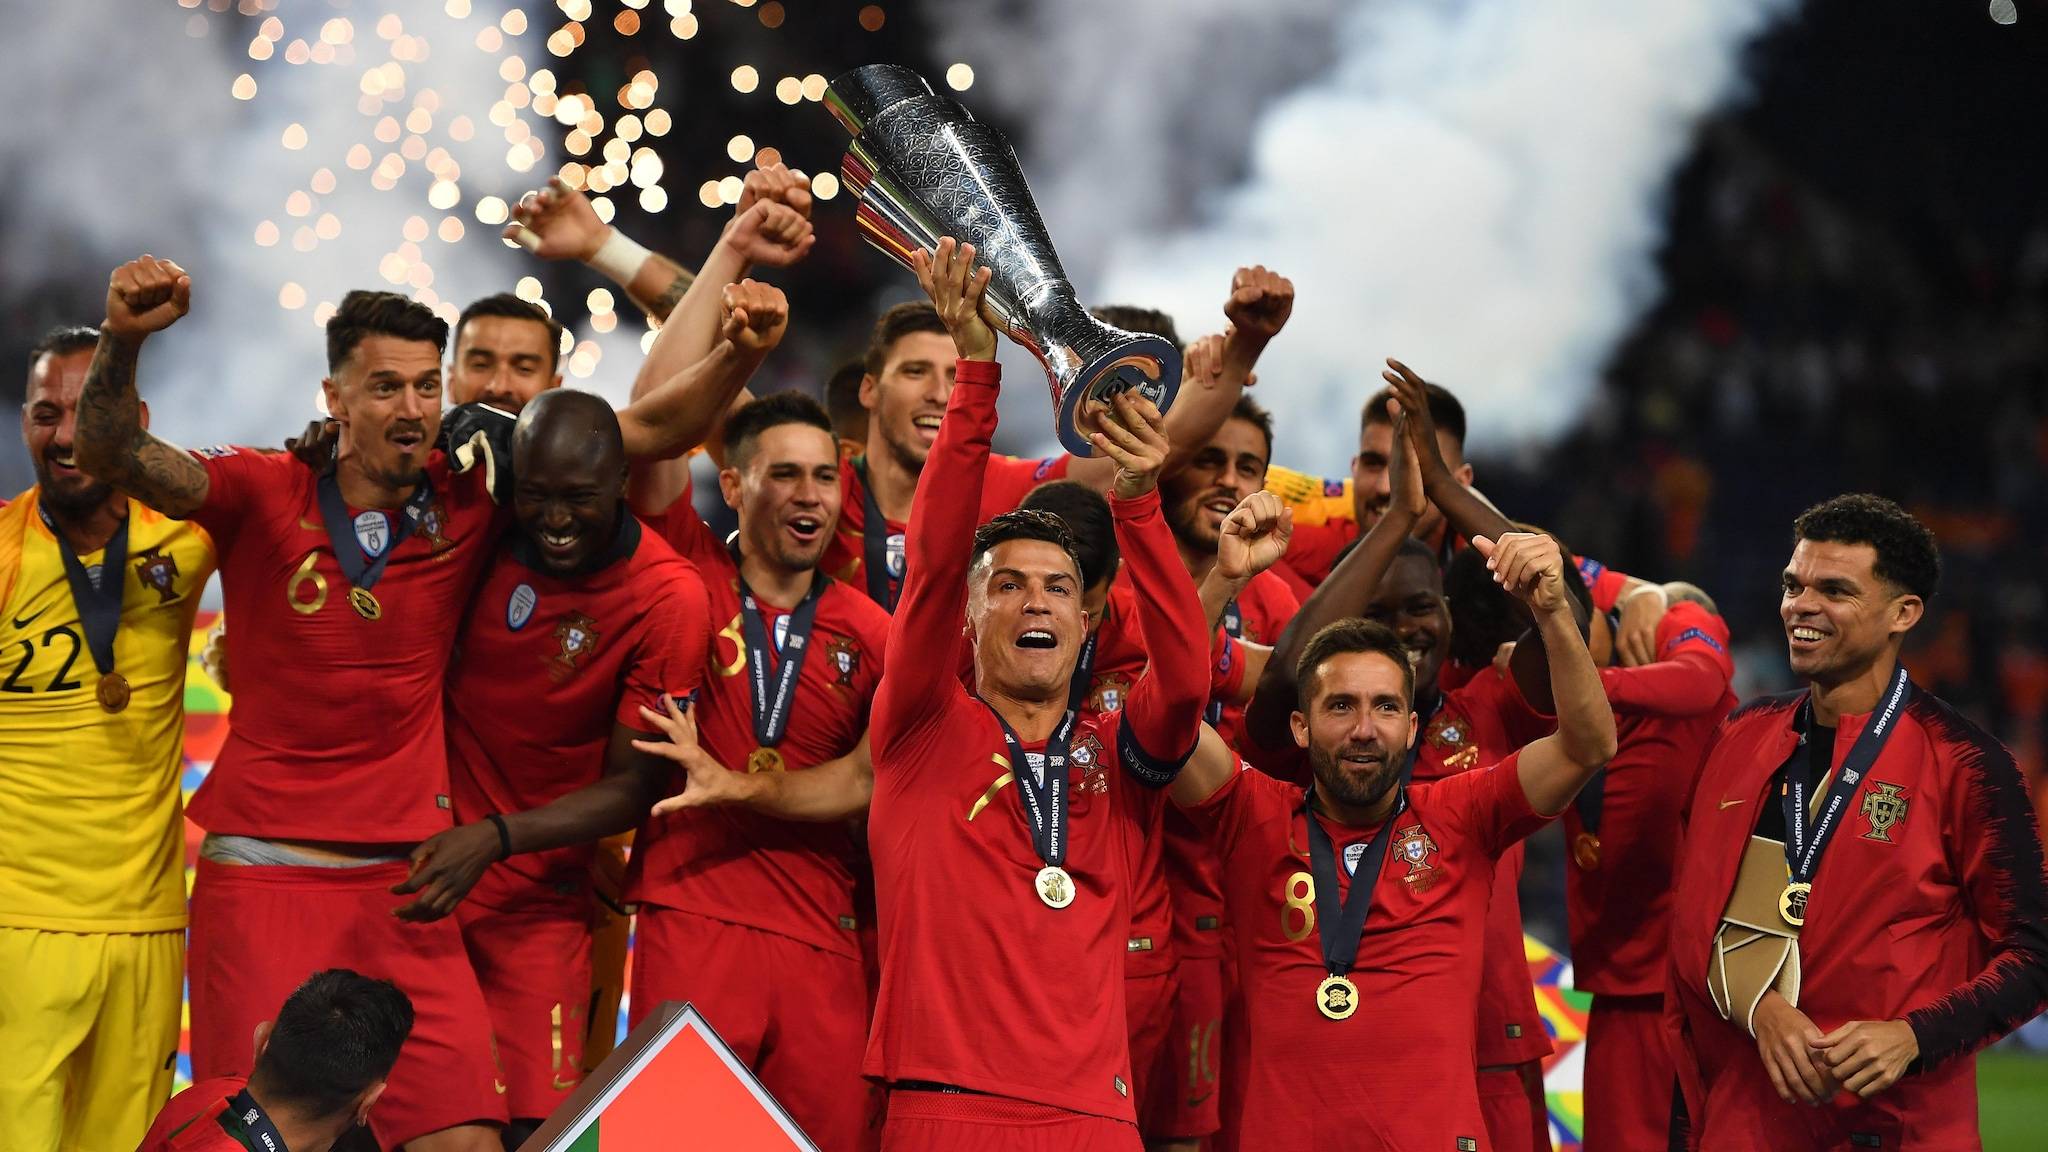 https://editorial.uefa.com/resources/026d-135df74130f3-a43ffe28a56e-1000/portugal_v_netherlands_-_uefa_nations_league_2019_final.jpeg